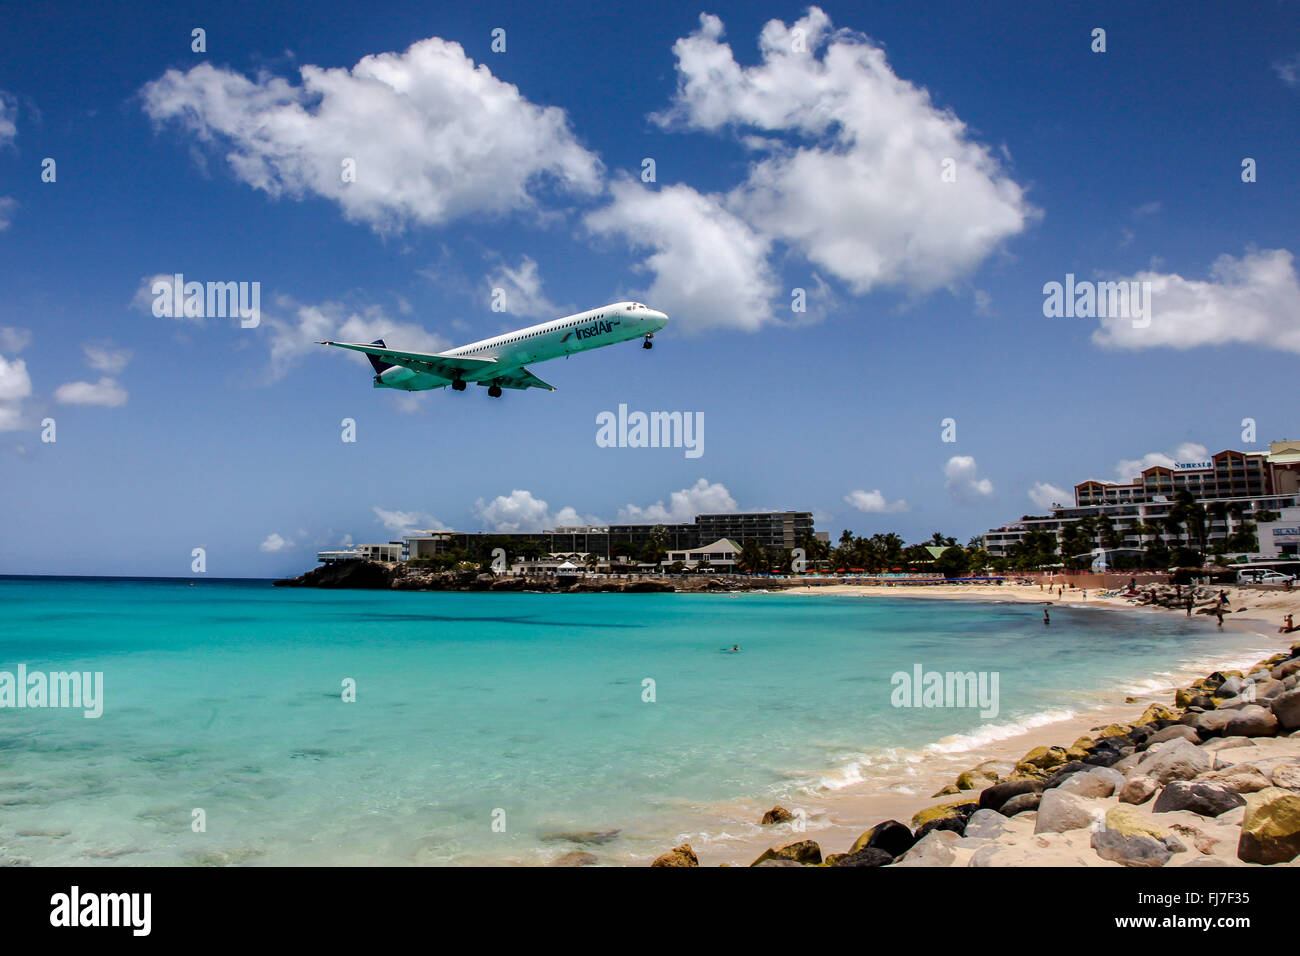 Insel Air Flugzeug Landung auf Princess Juliana International Airport in St.Martin über Maho Bye Strand Stockbild